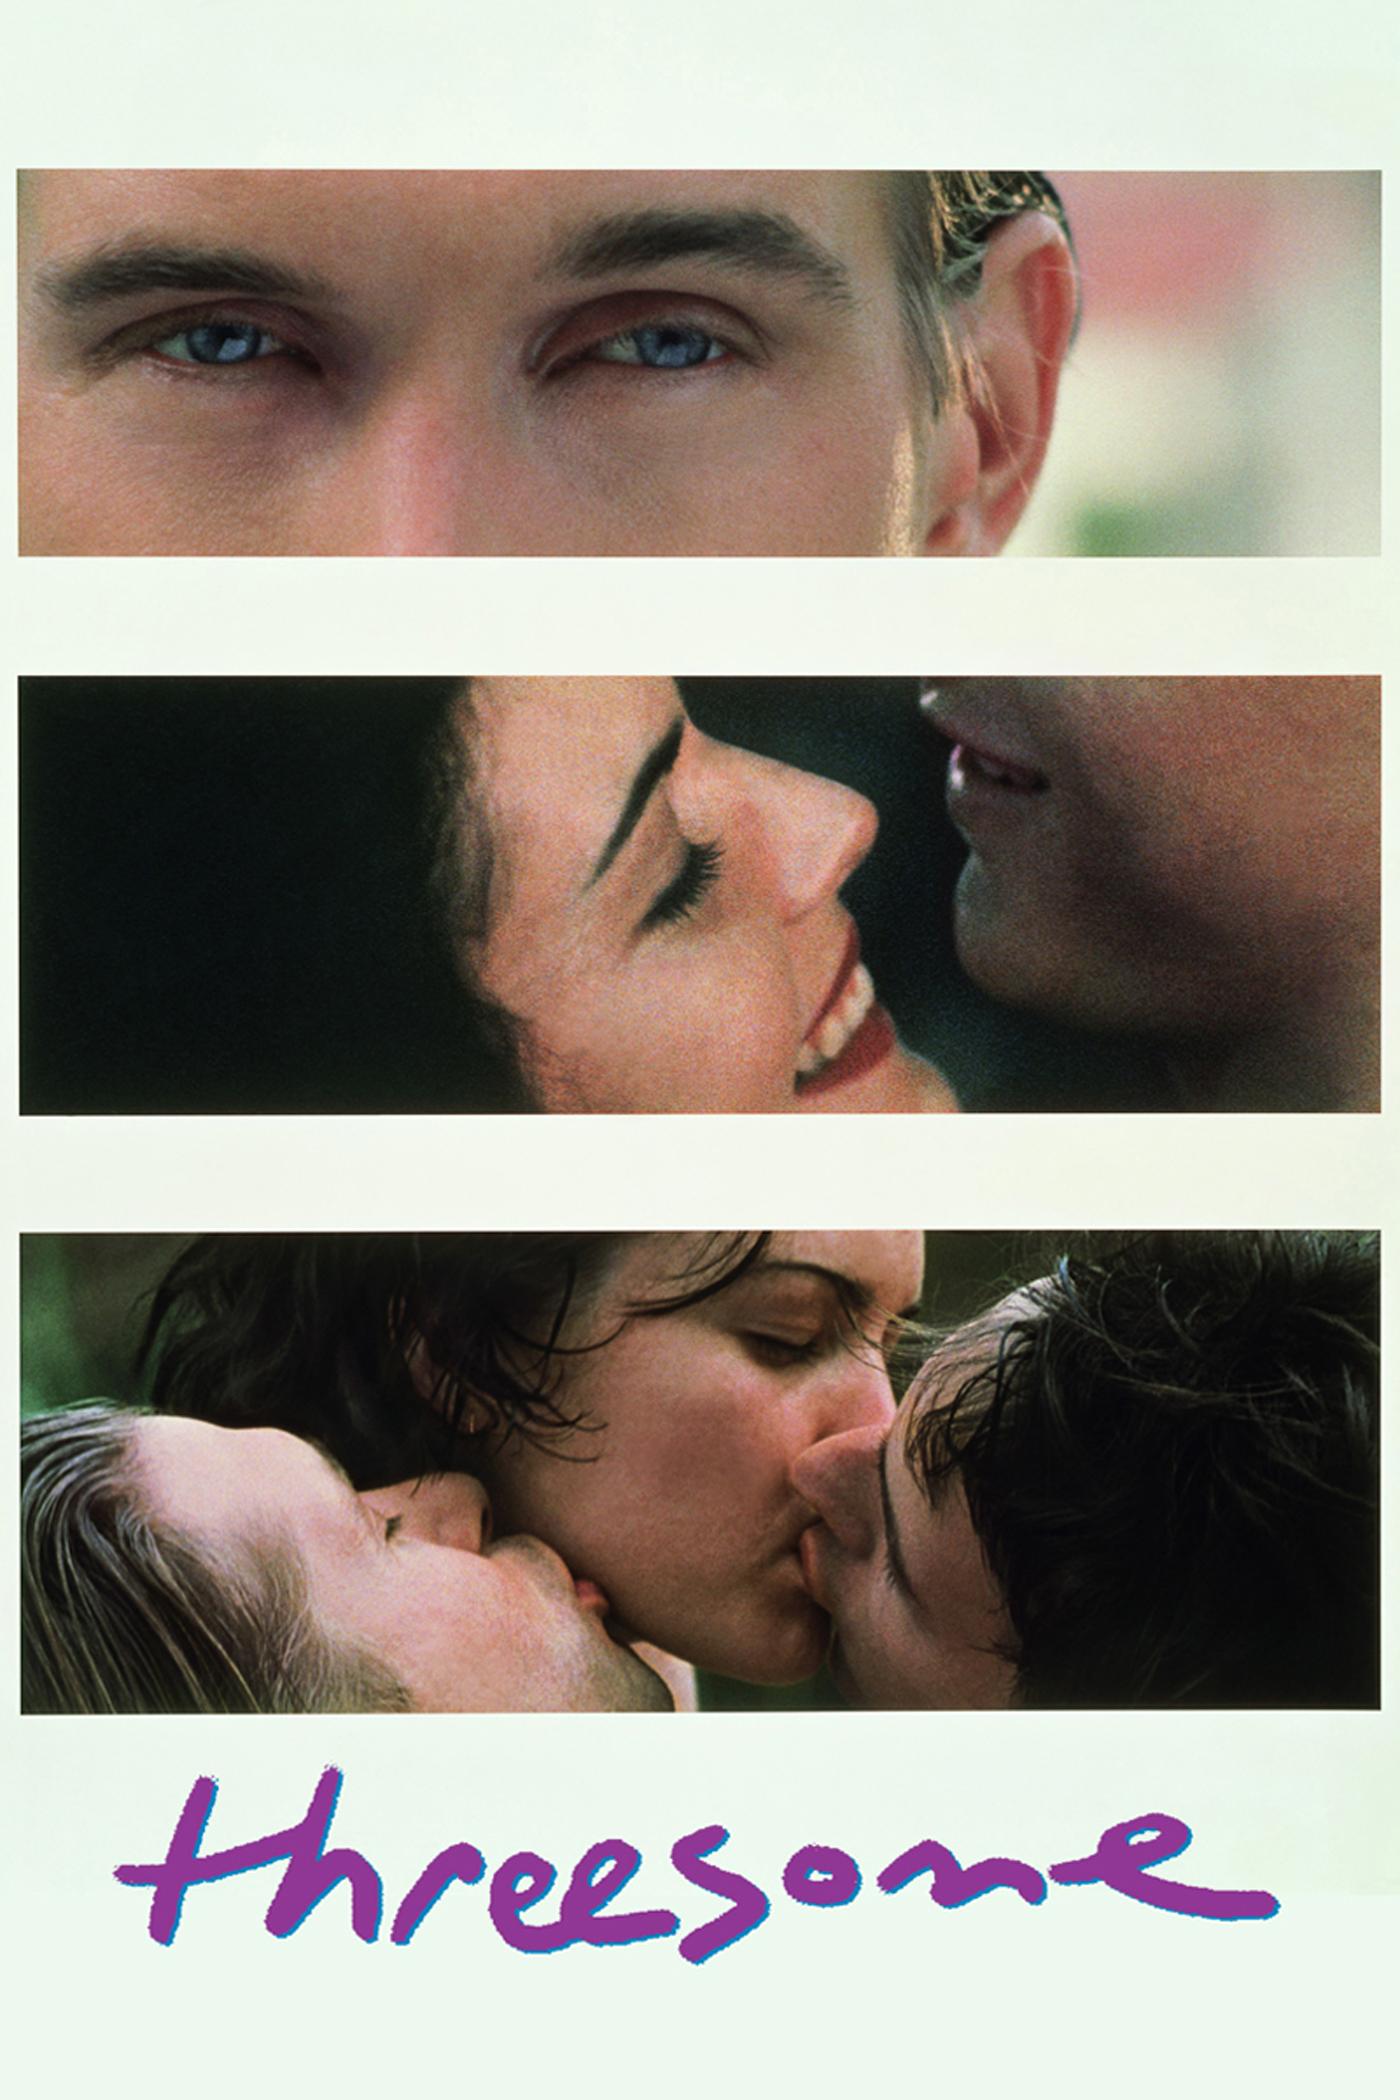 threesome 1994 movie zshare